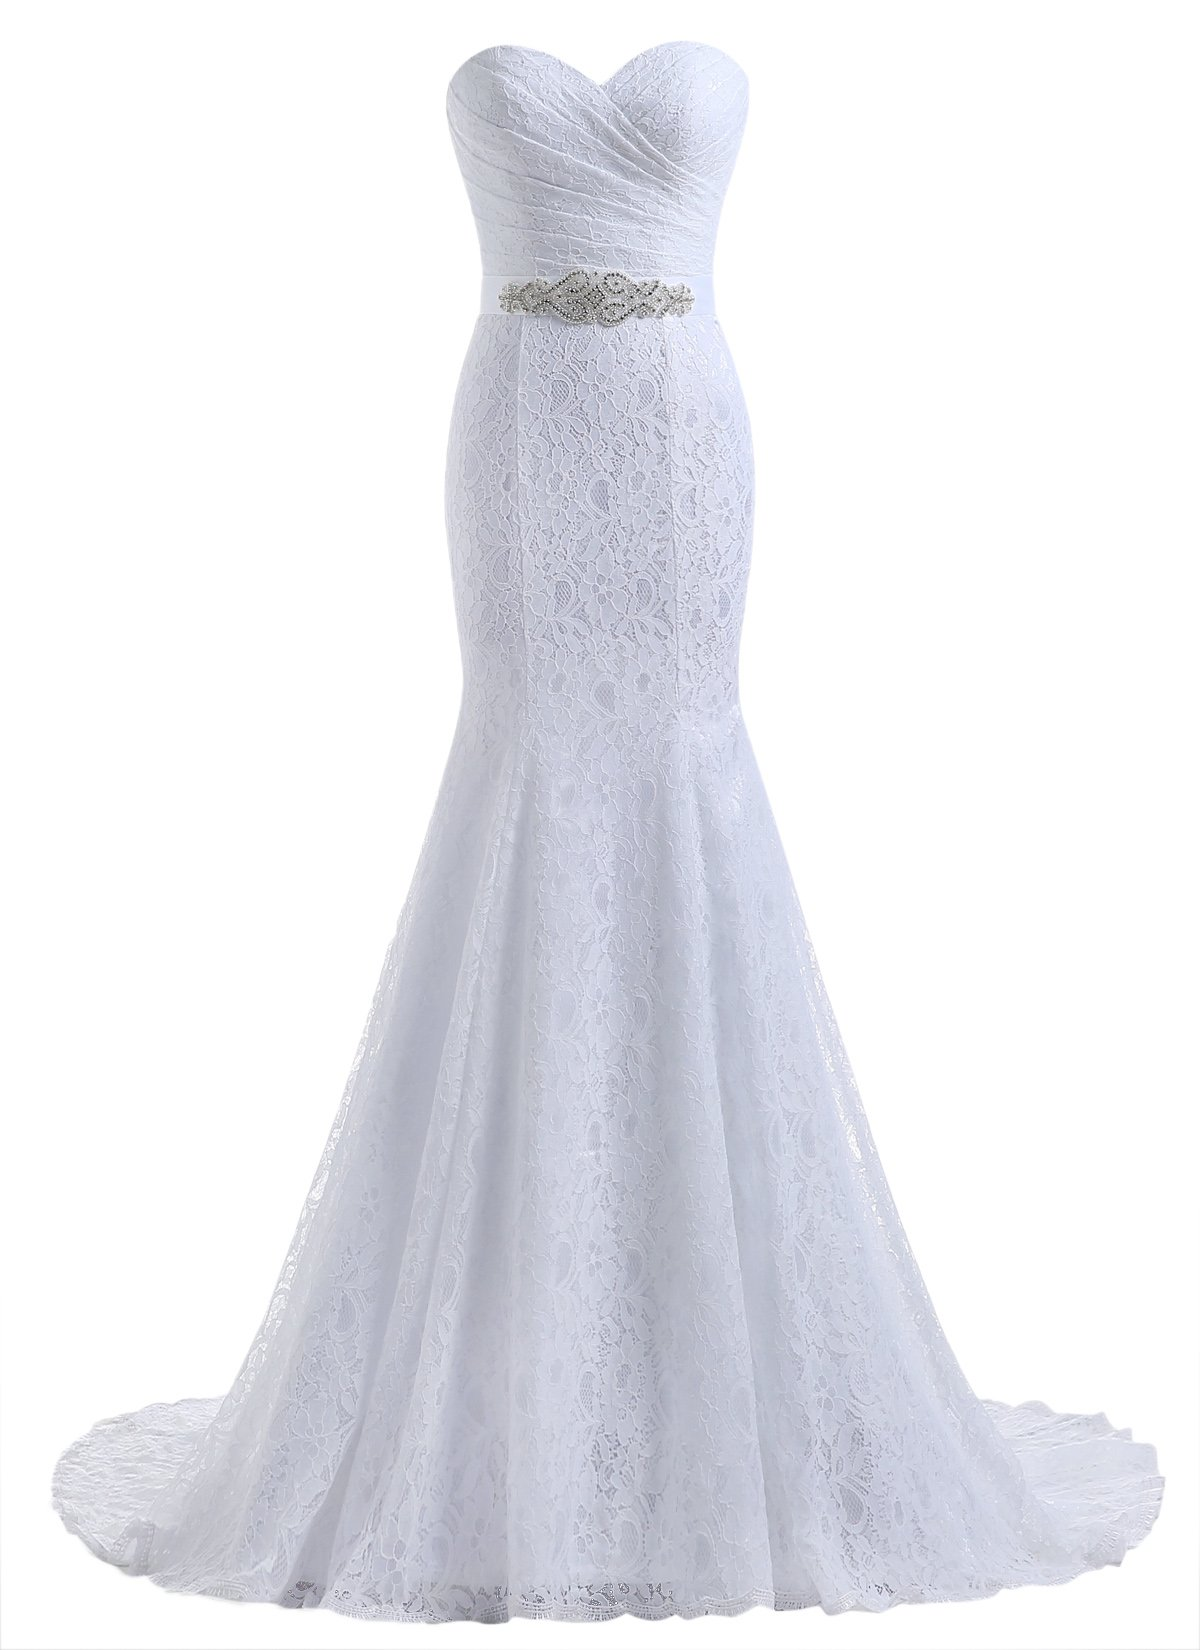 Beautyprom Women's Lace Mermaid Bridal Wedding Dresses White US10